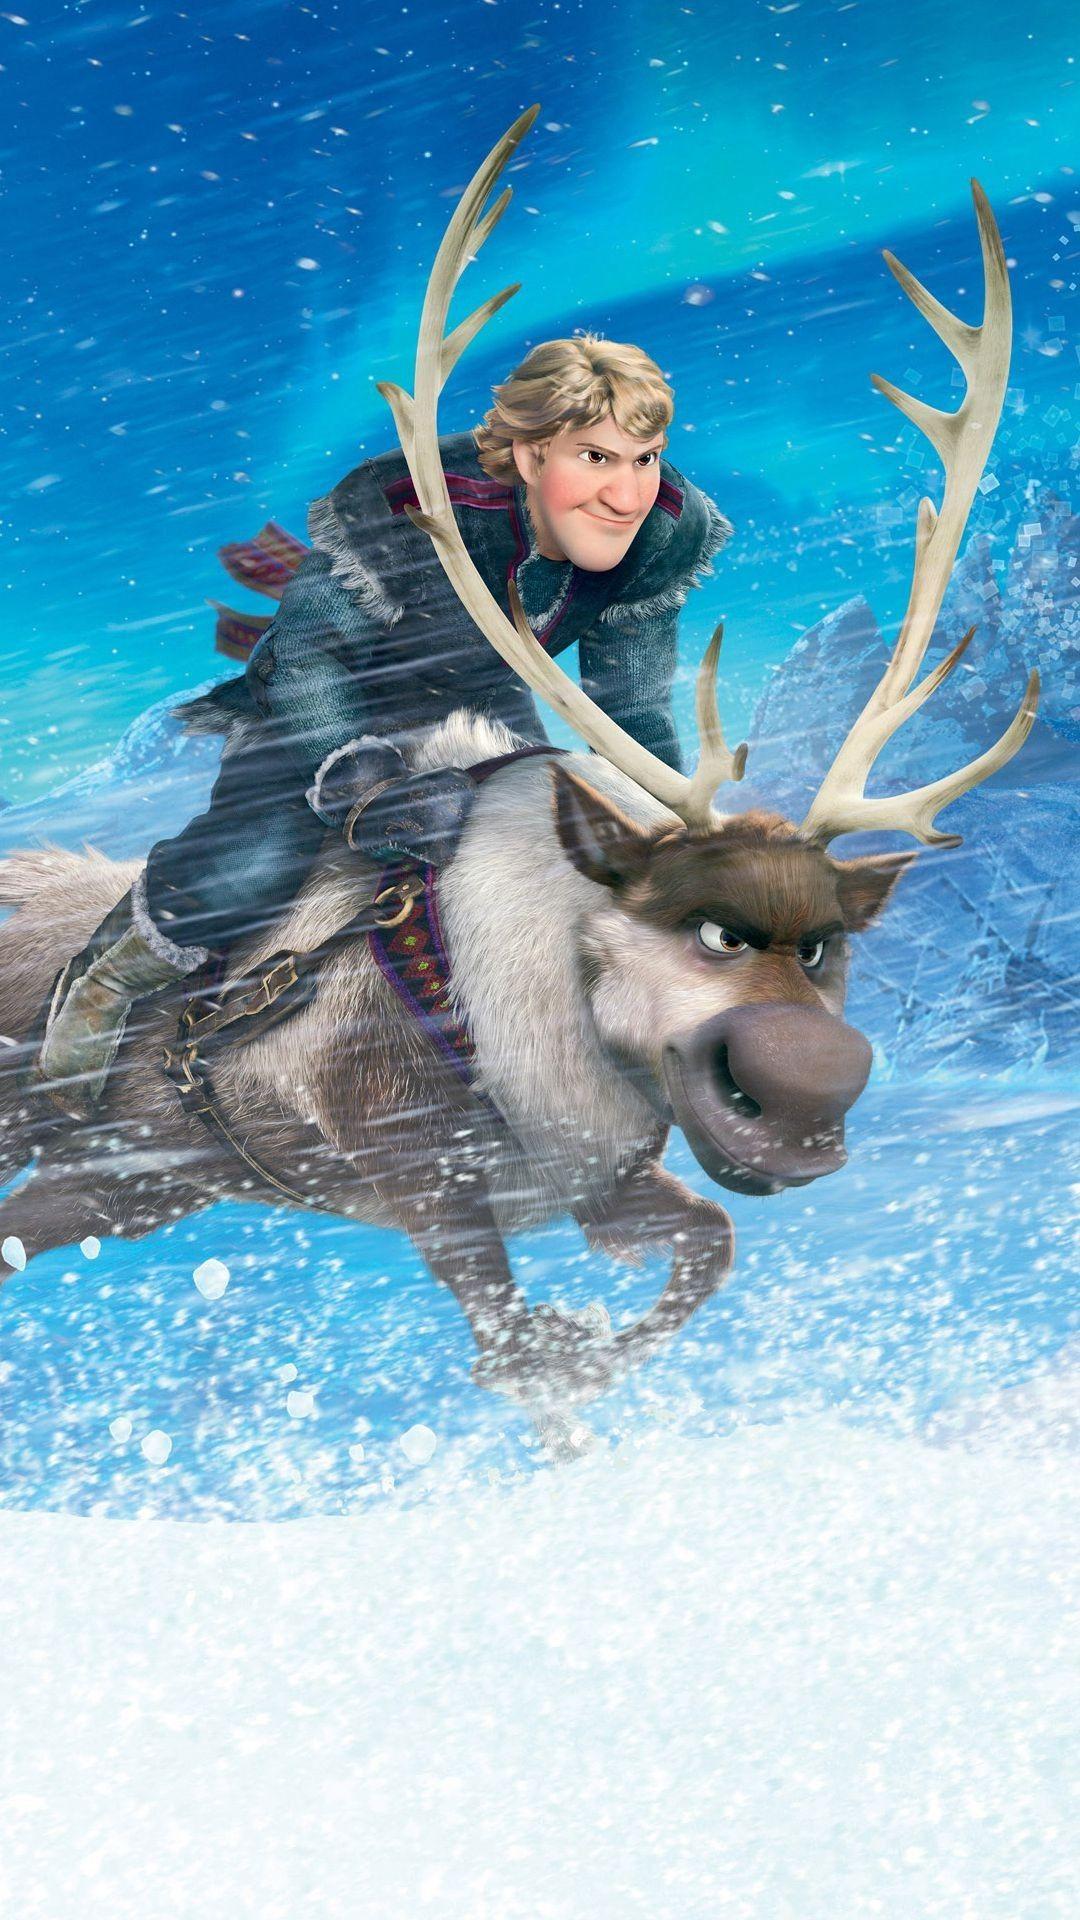 2014 Halloween Sven Kristoff In The SnowStorm IPhone 6 Plus Wallpaper